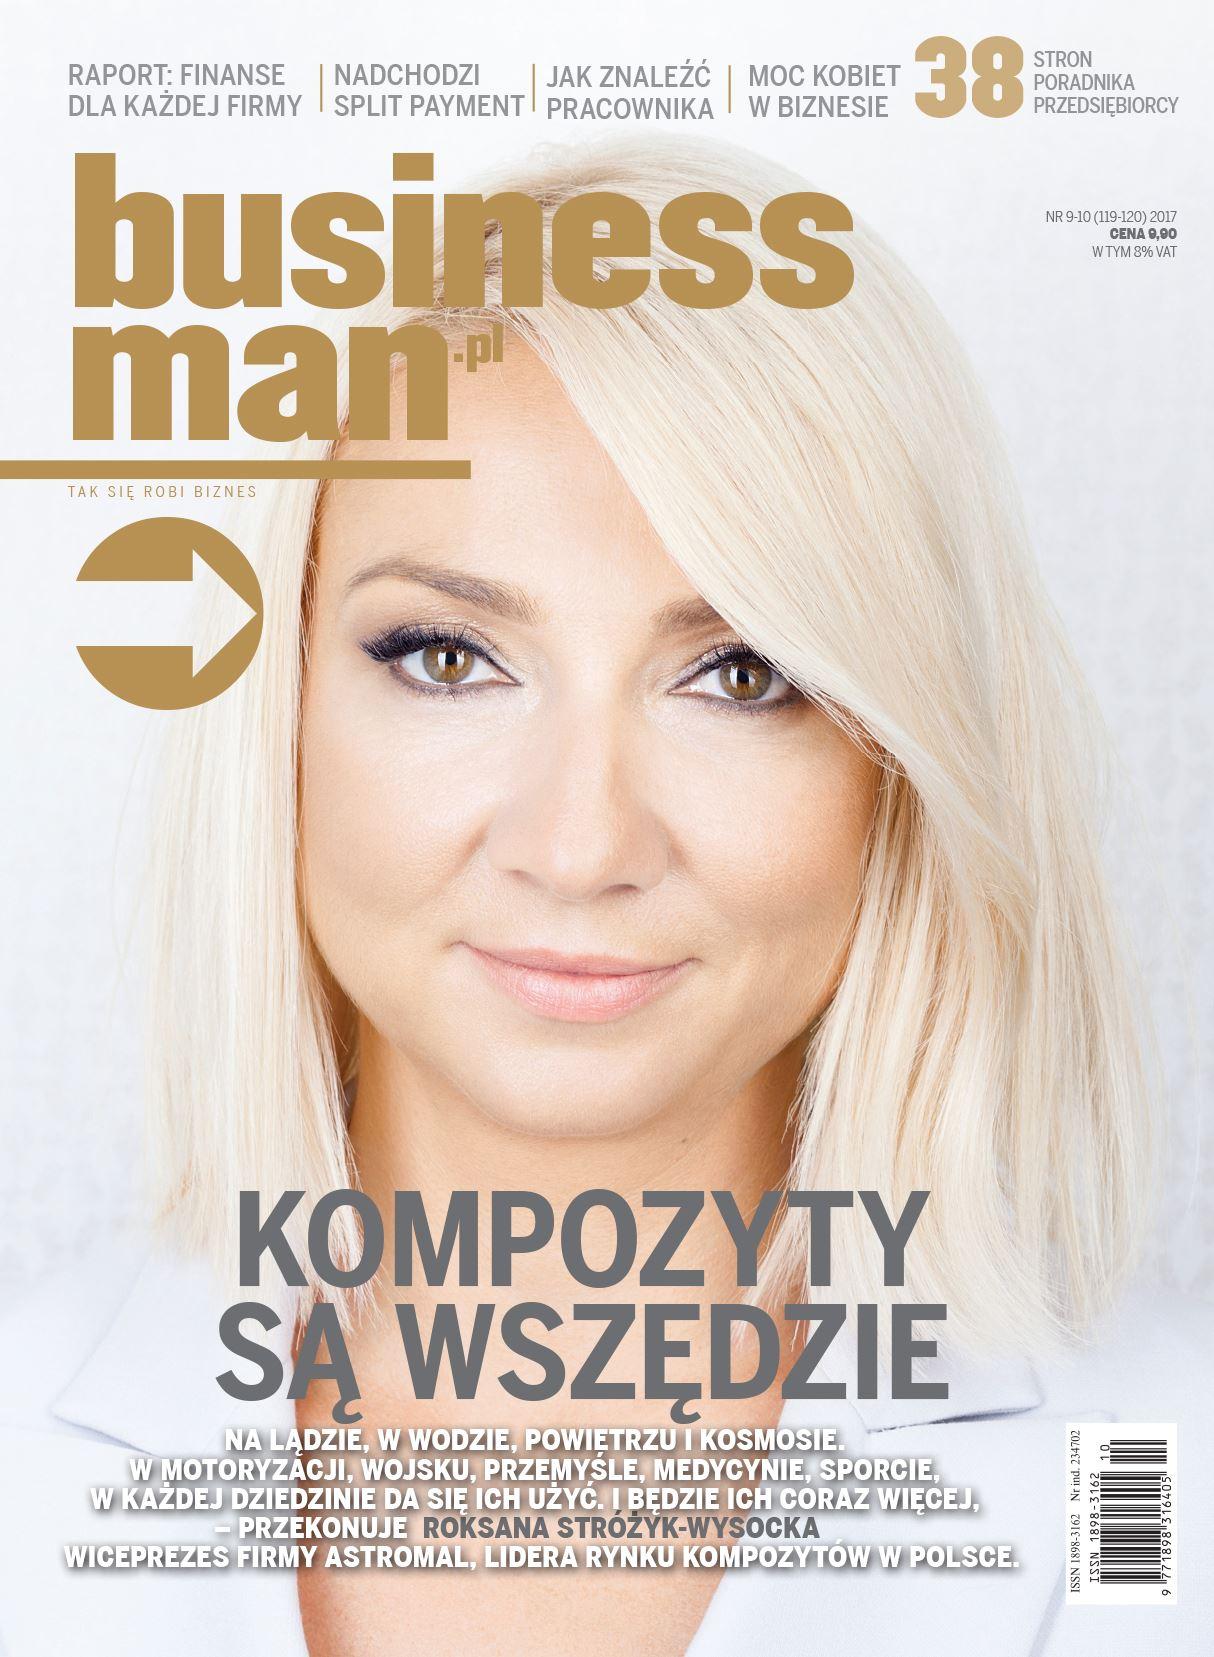 Roksana Strózyk - cover